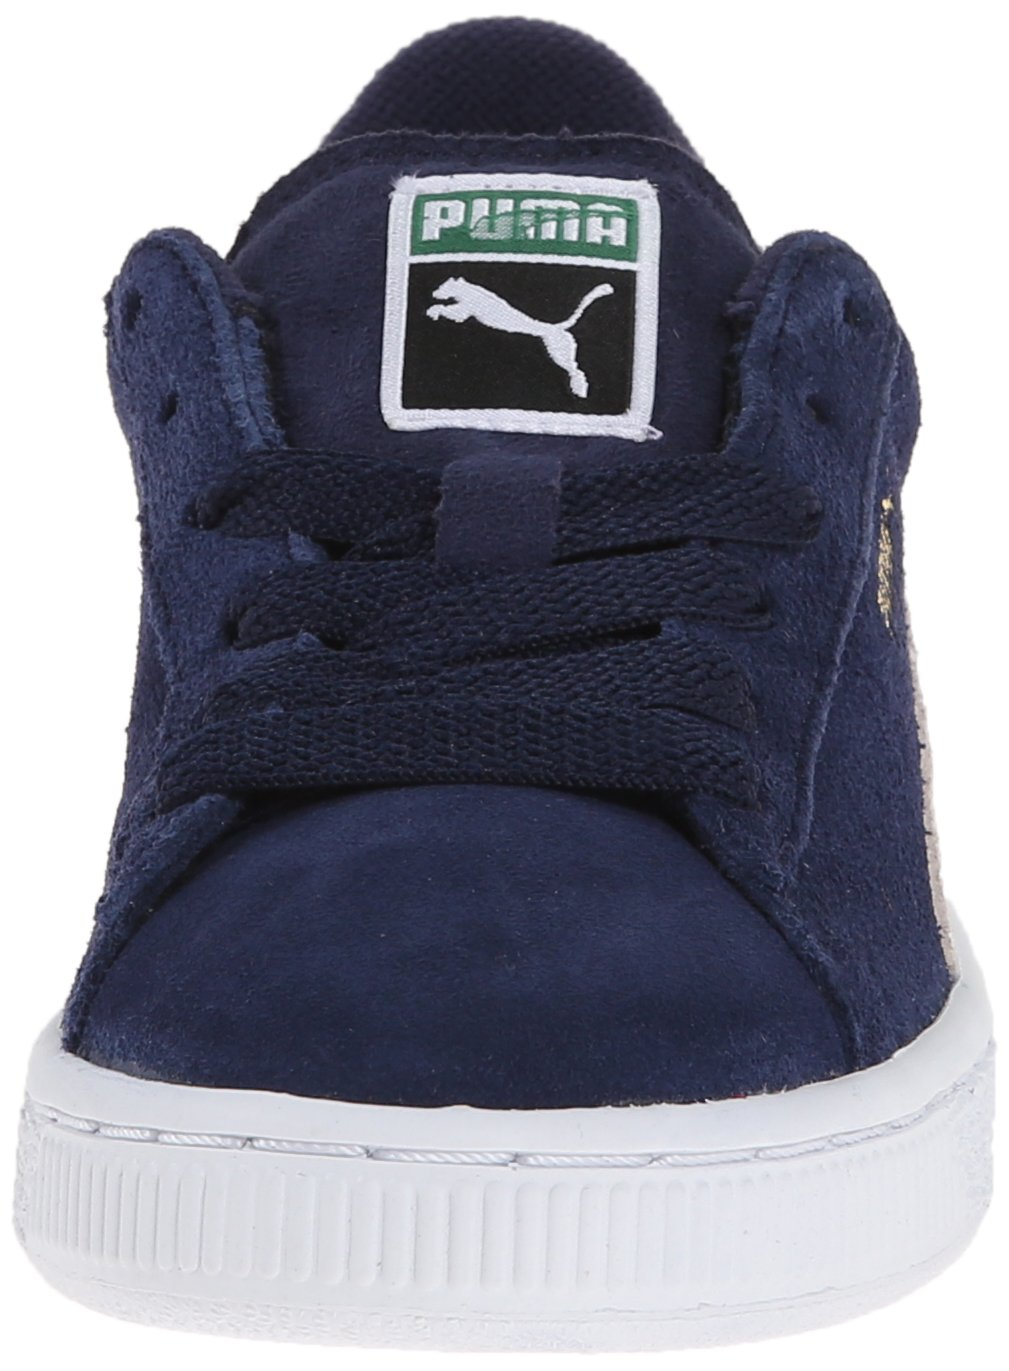 PUMA Suede JR Classic Kids Sneaker (Little Kid/Big Kid) B00OBV1A9E Kid|Peacoat/Team 12.5 M US Little Kid|Peacoat/Team B00OBV1A9E Gold 06ebd7